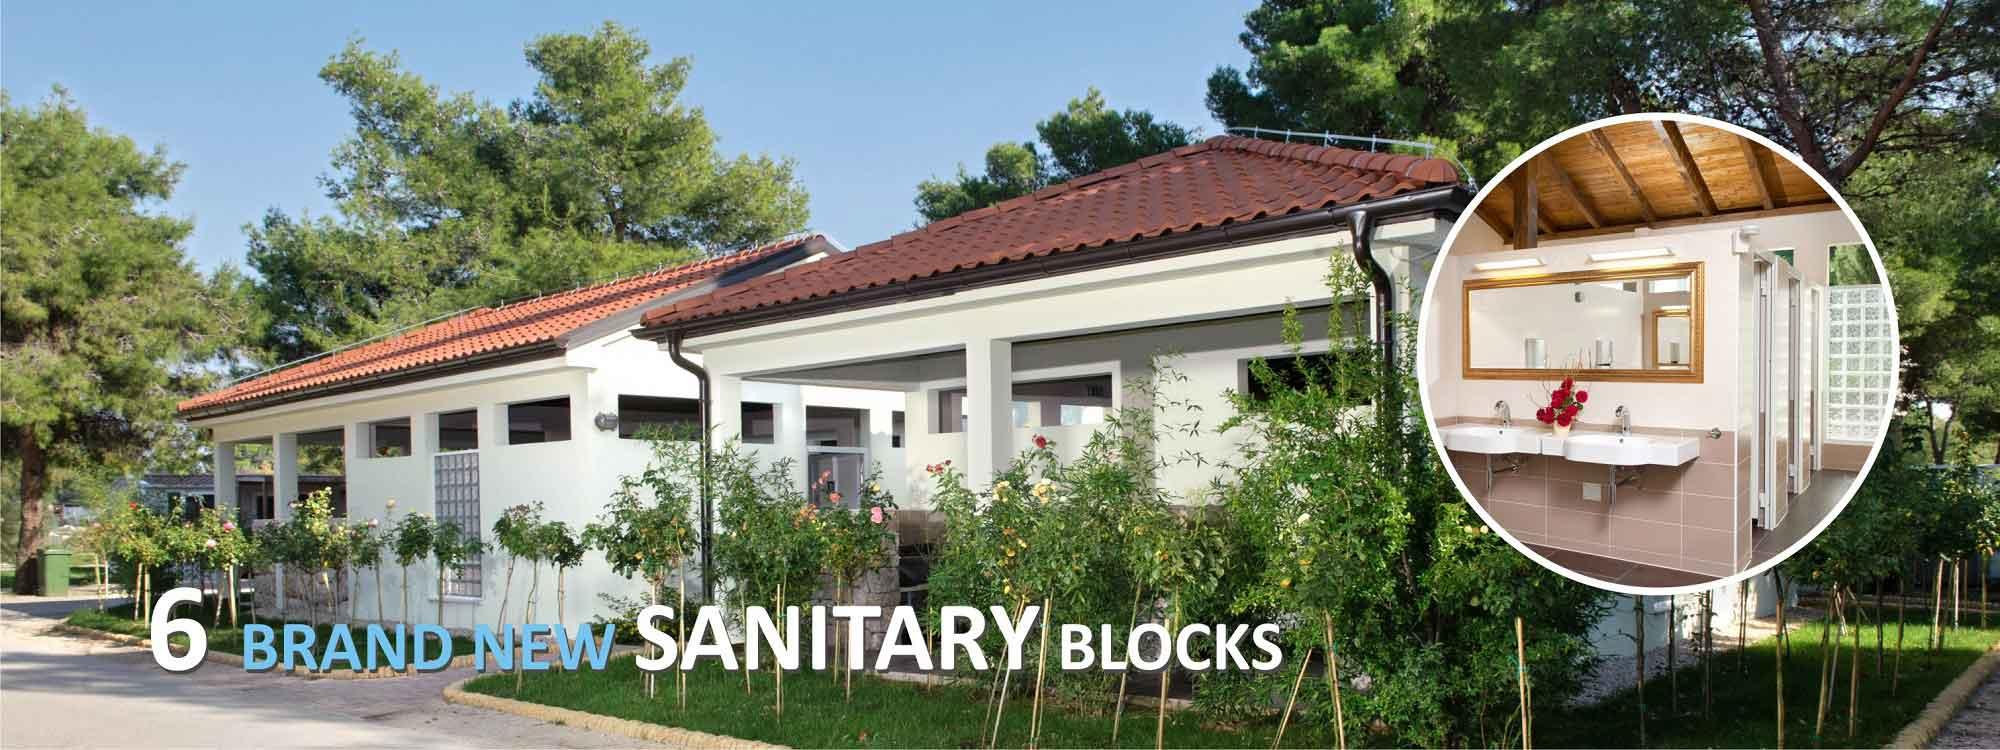 Solaris_camping_beach_resort_croatia_brand_new_sanitary_blocks